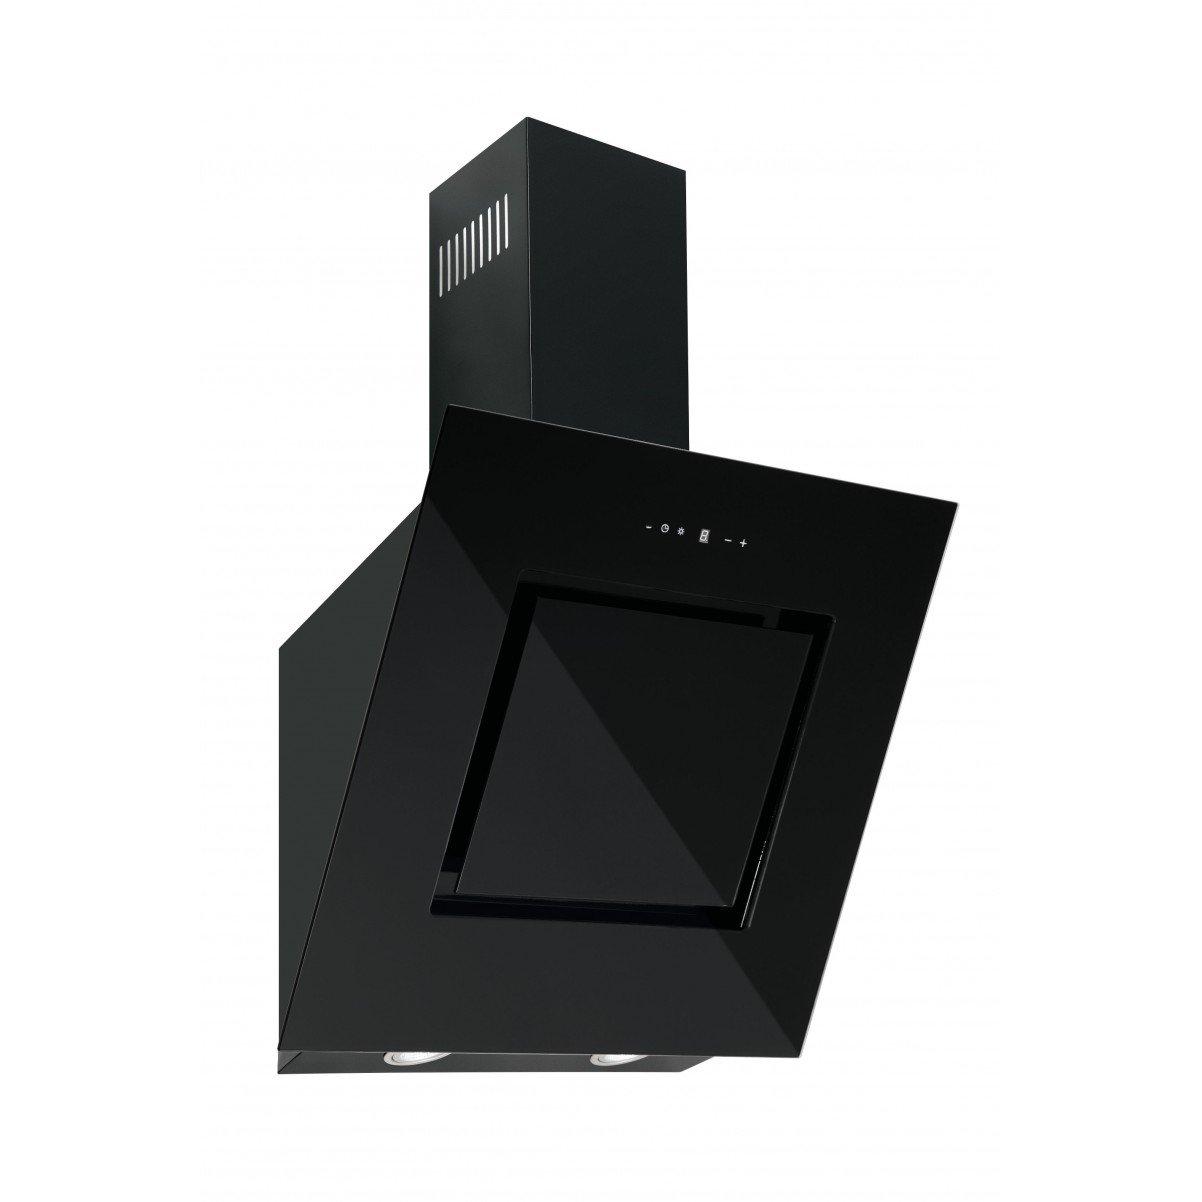 Vägghängd köksfläkt Rosvik svart  glas 60cm/80cm/90cm